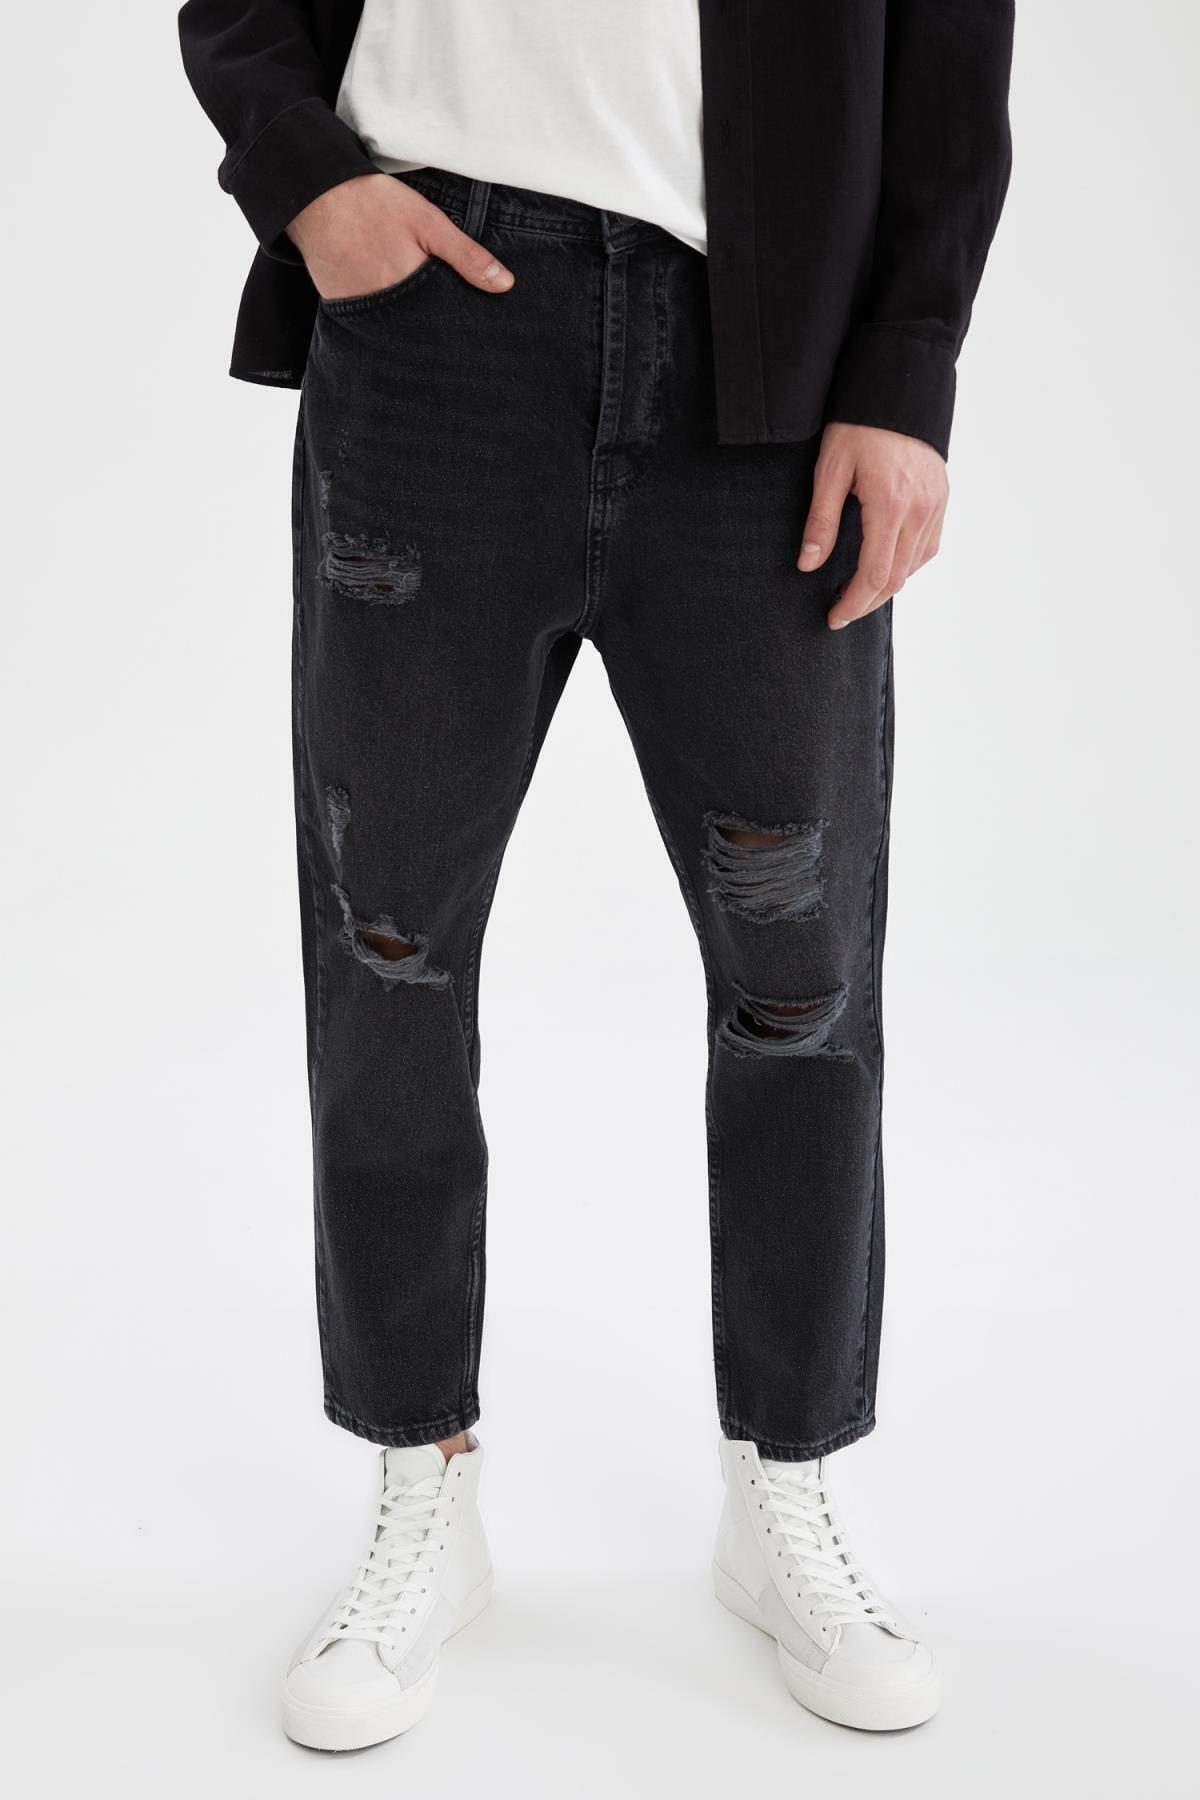 Erkek Siyah Loose Fit Normal Bel Boru Paça Siyah Jean Pantolon U5157AZ21SMNM